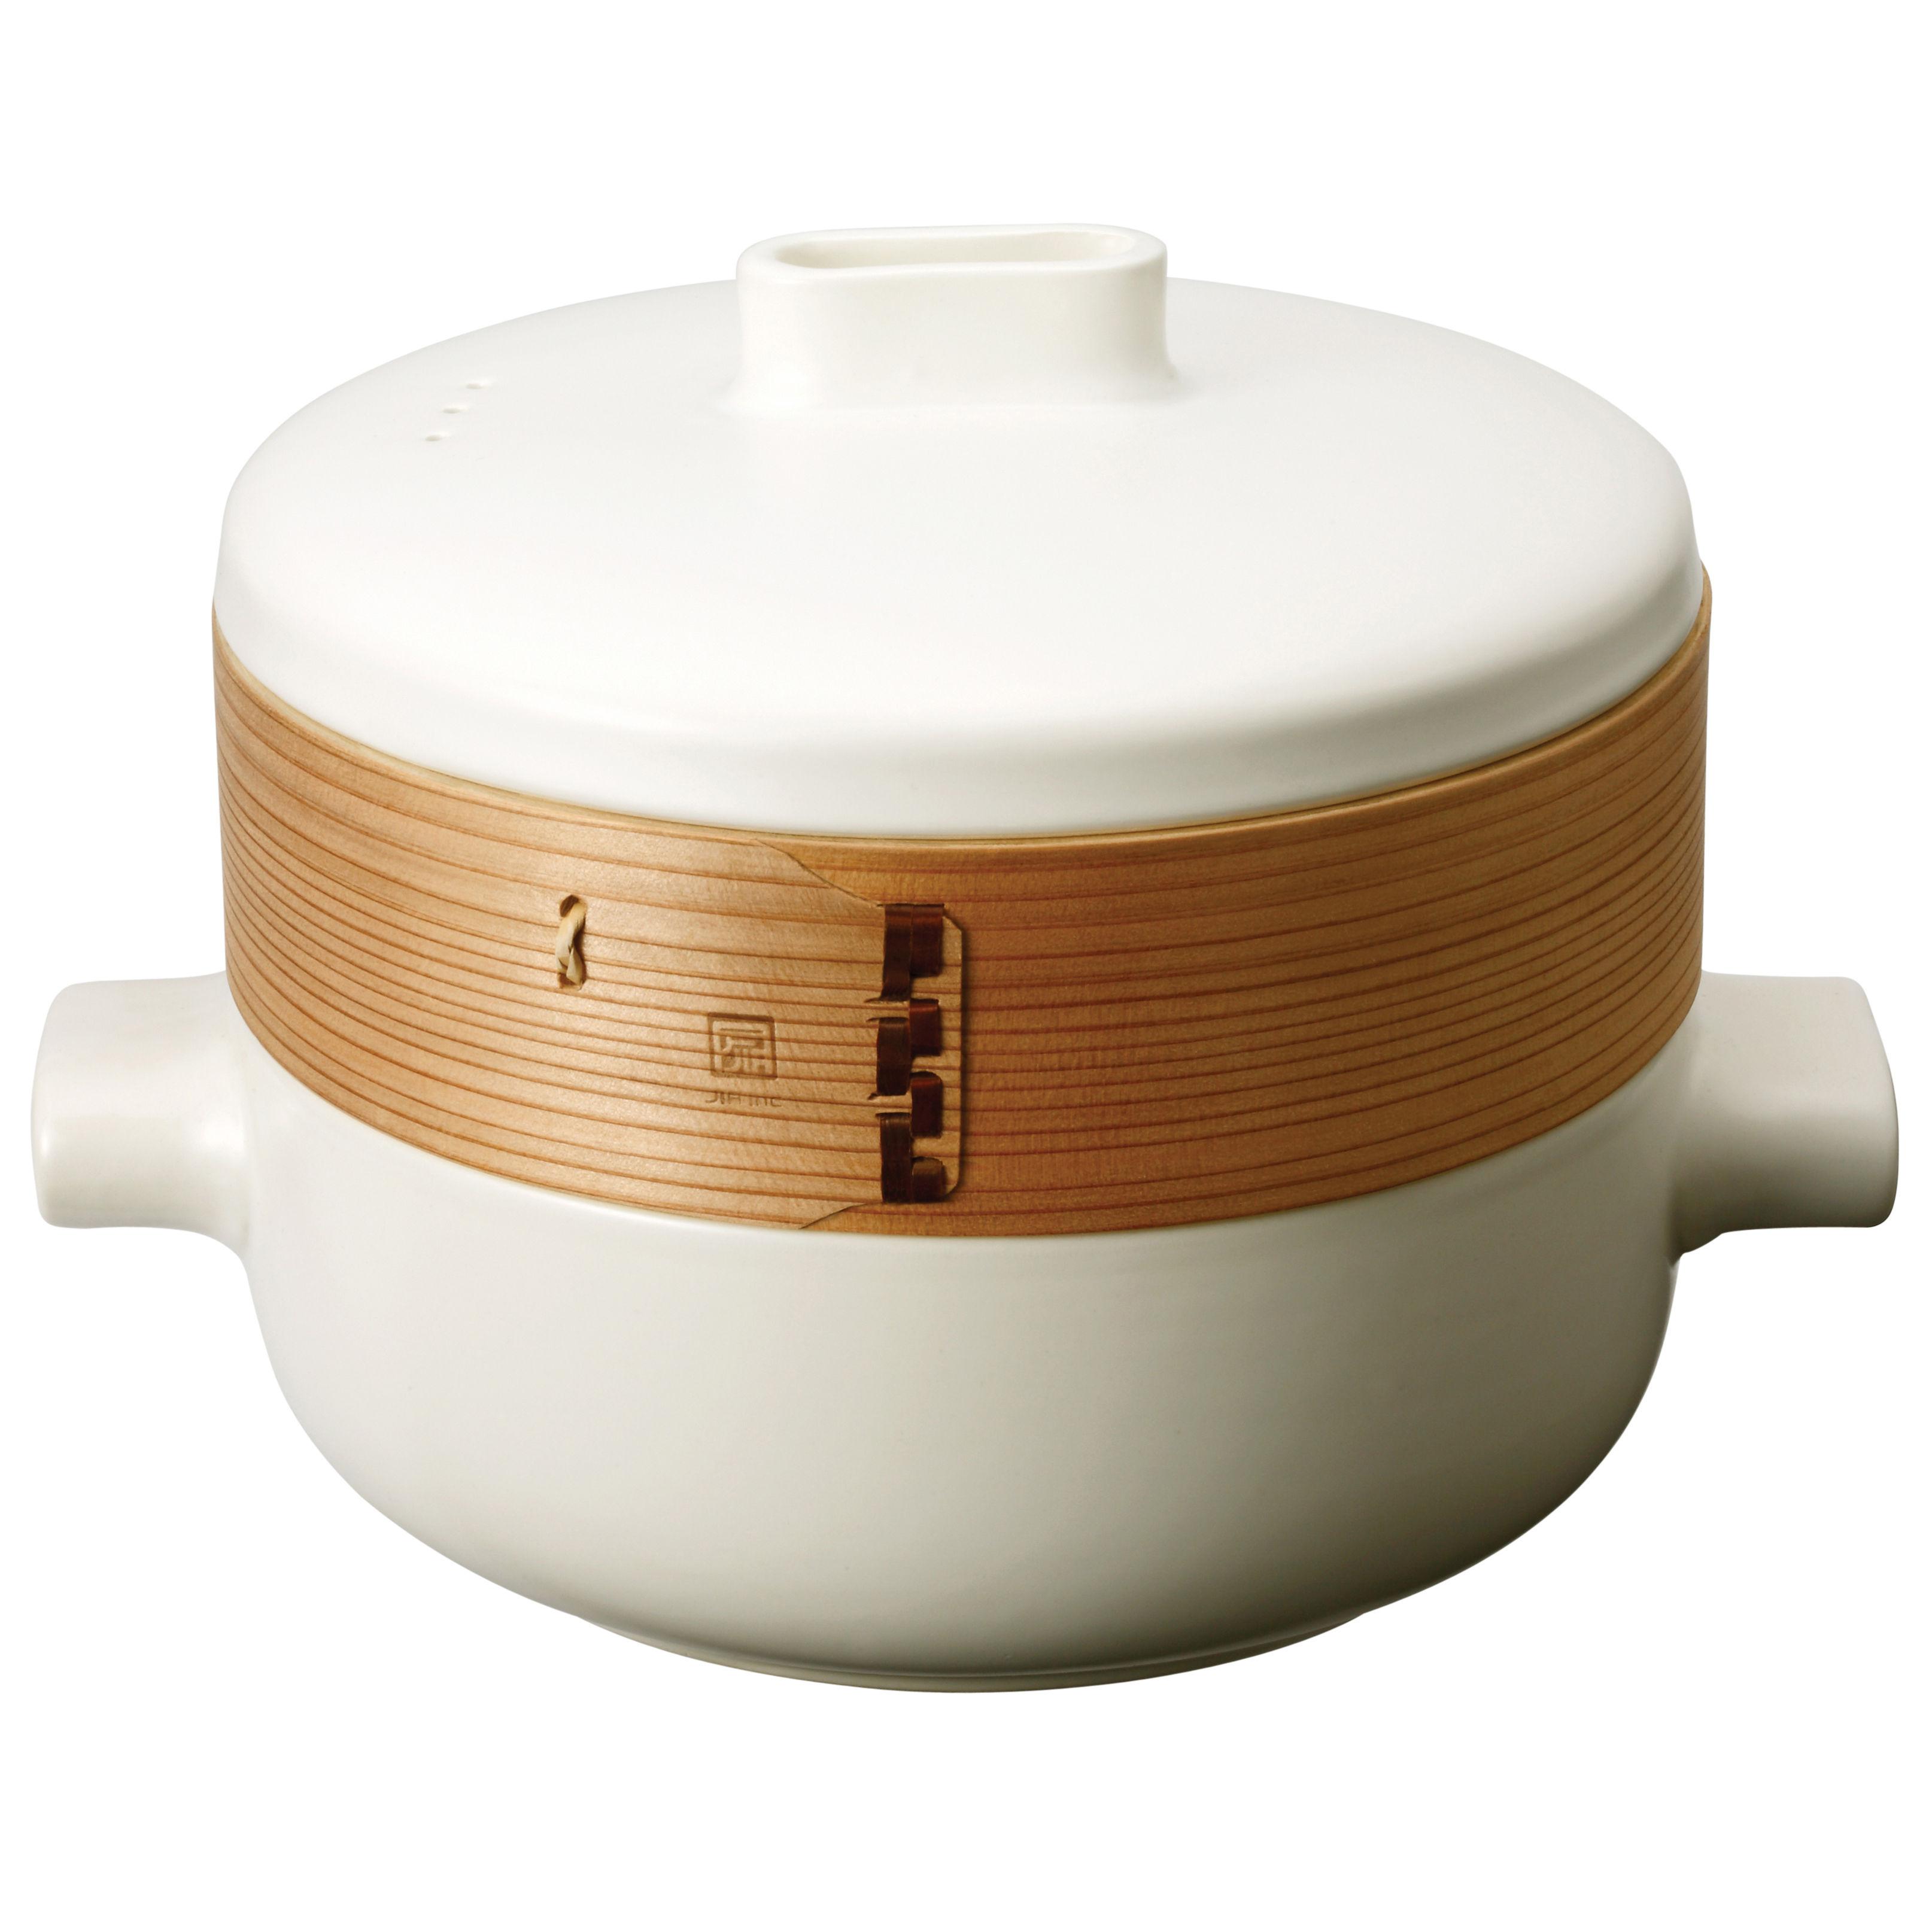 scopri cuiseur vapeur steamer set set pentola cesta bianco e legno di jia made in design. Black Bedroom Furniture Sets. Home Design Ideas